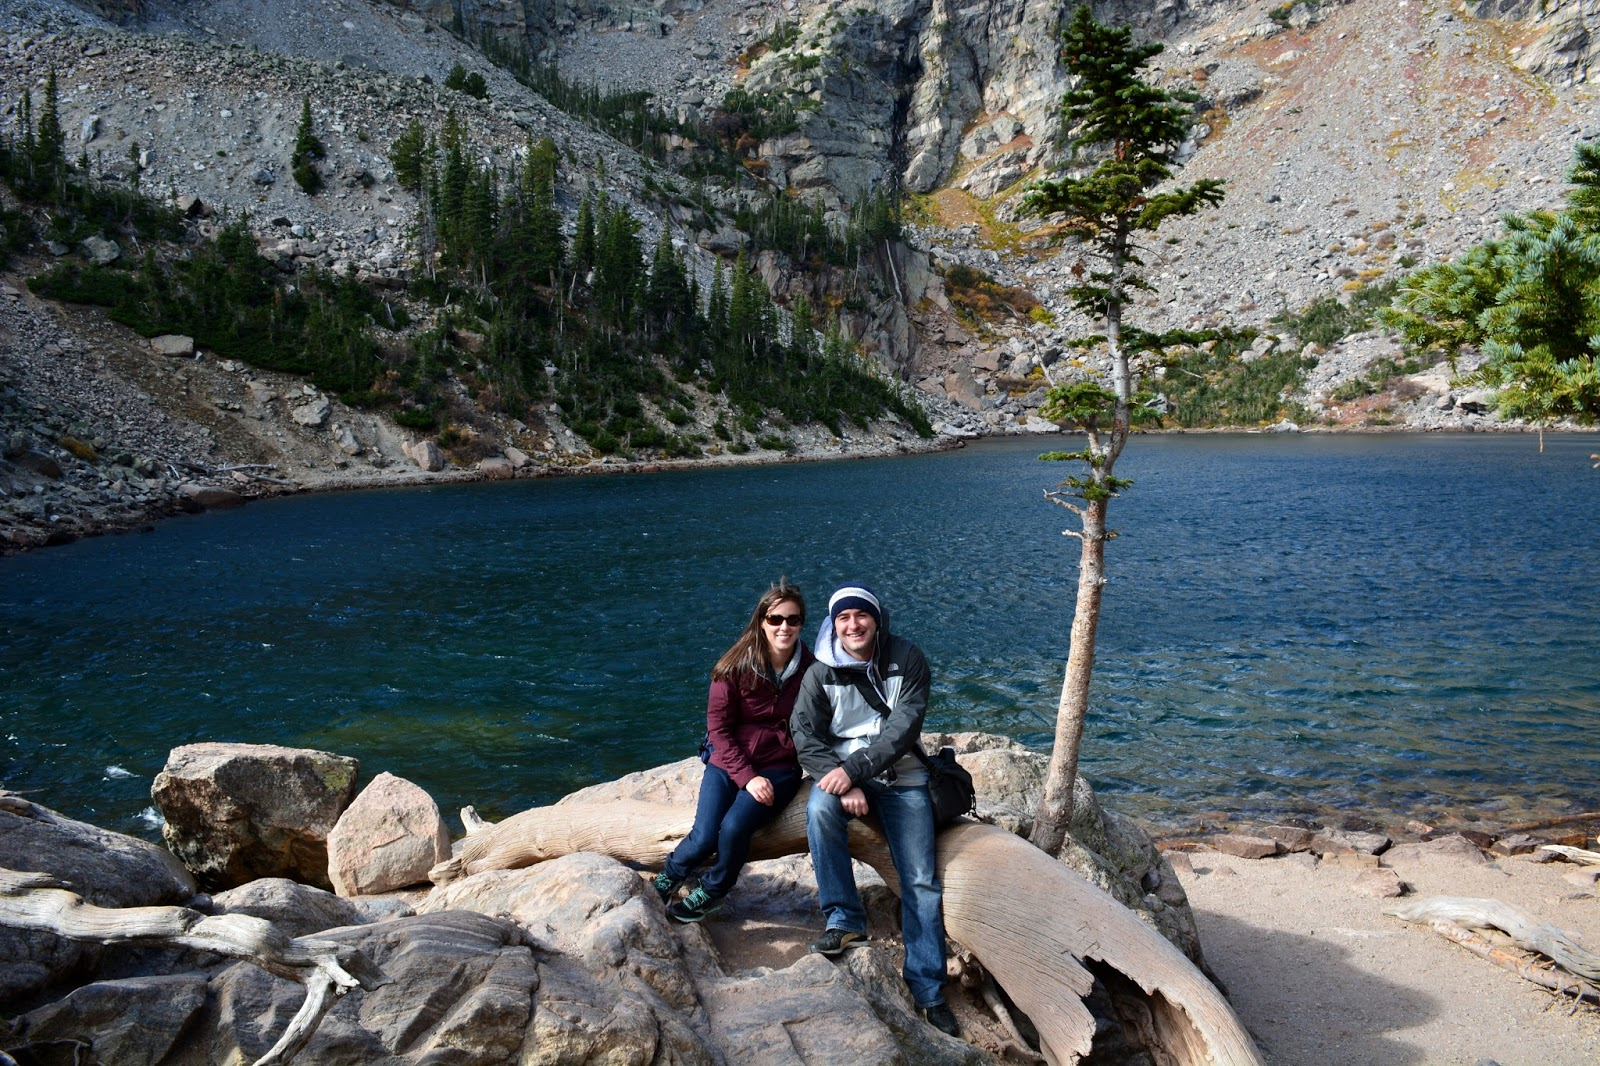 cozy birdhouse | emerald lake at rocky mountain national park